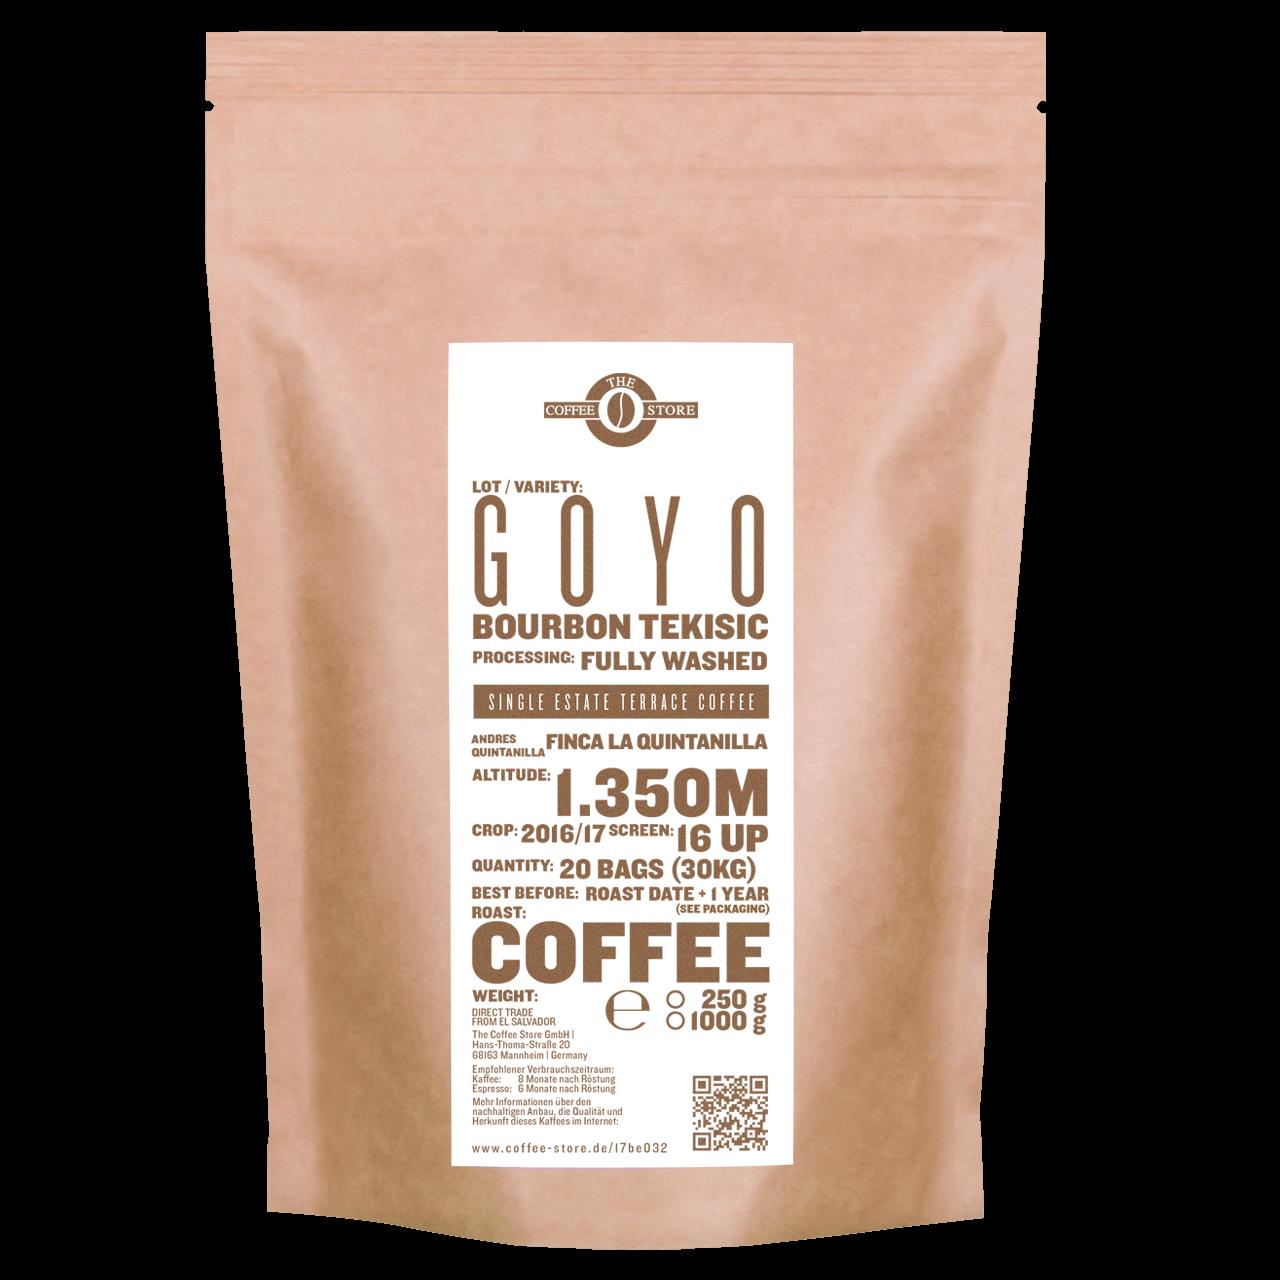 Goyo, Bourbon Tekisic - Kaffeeröstung